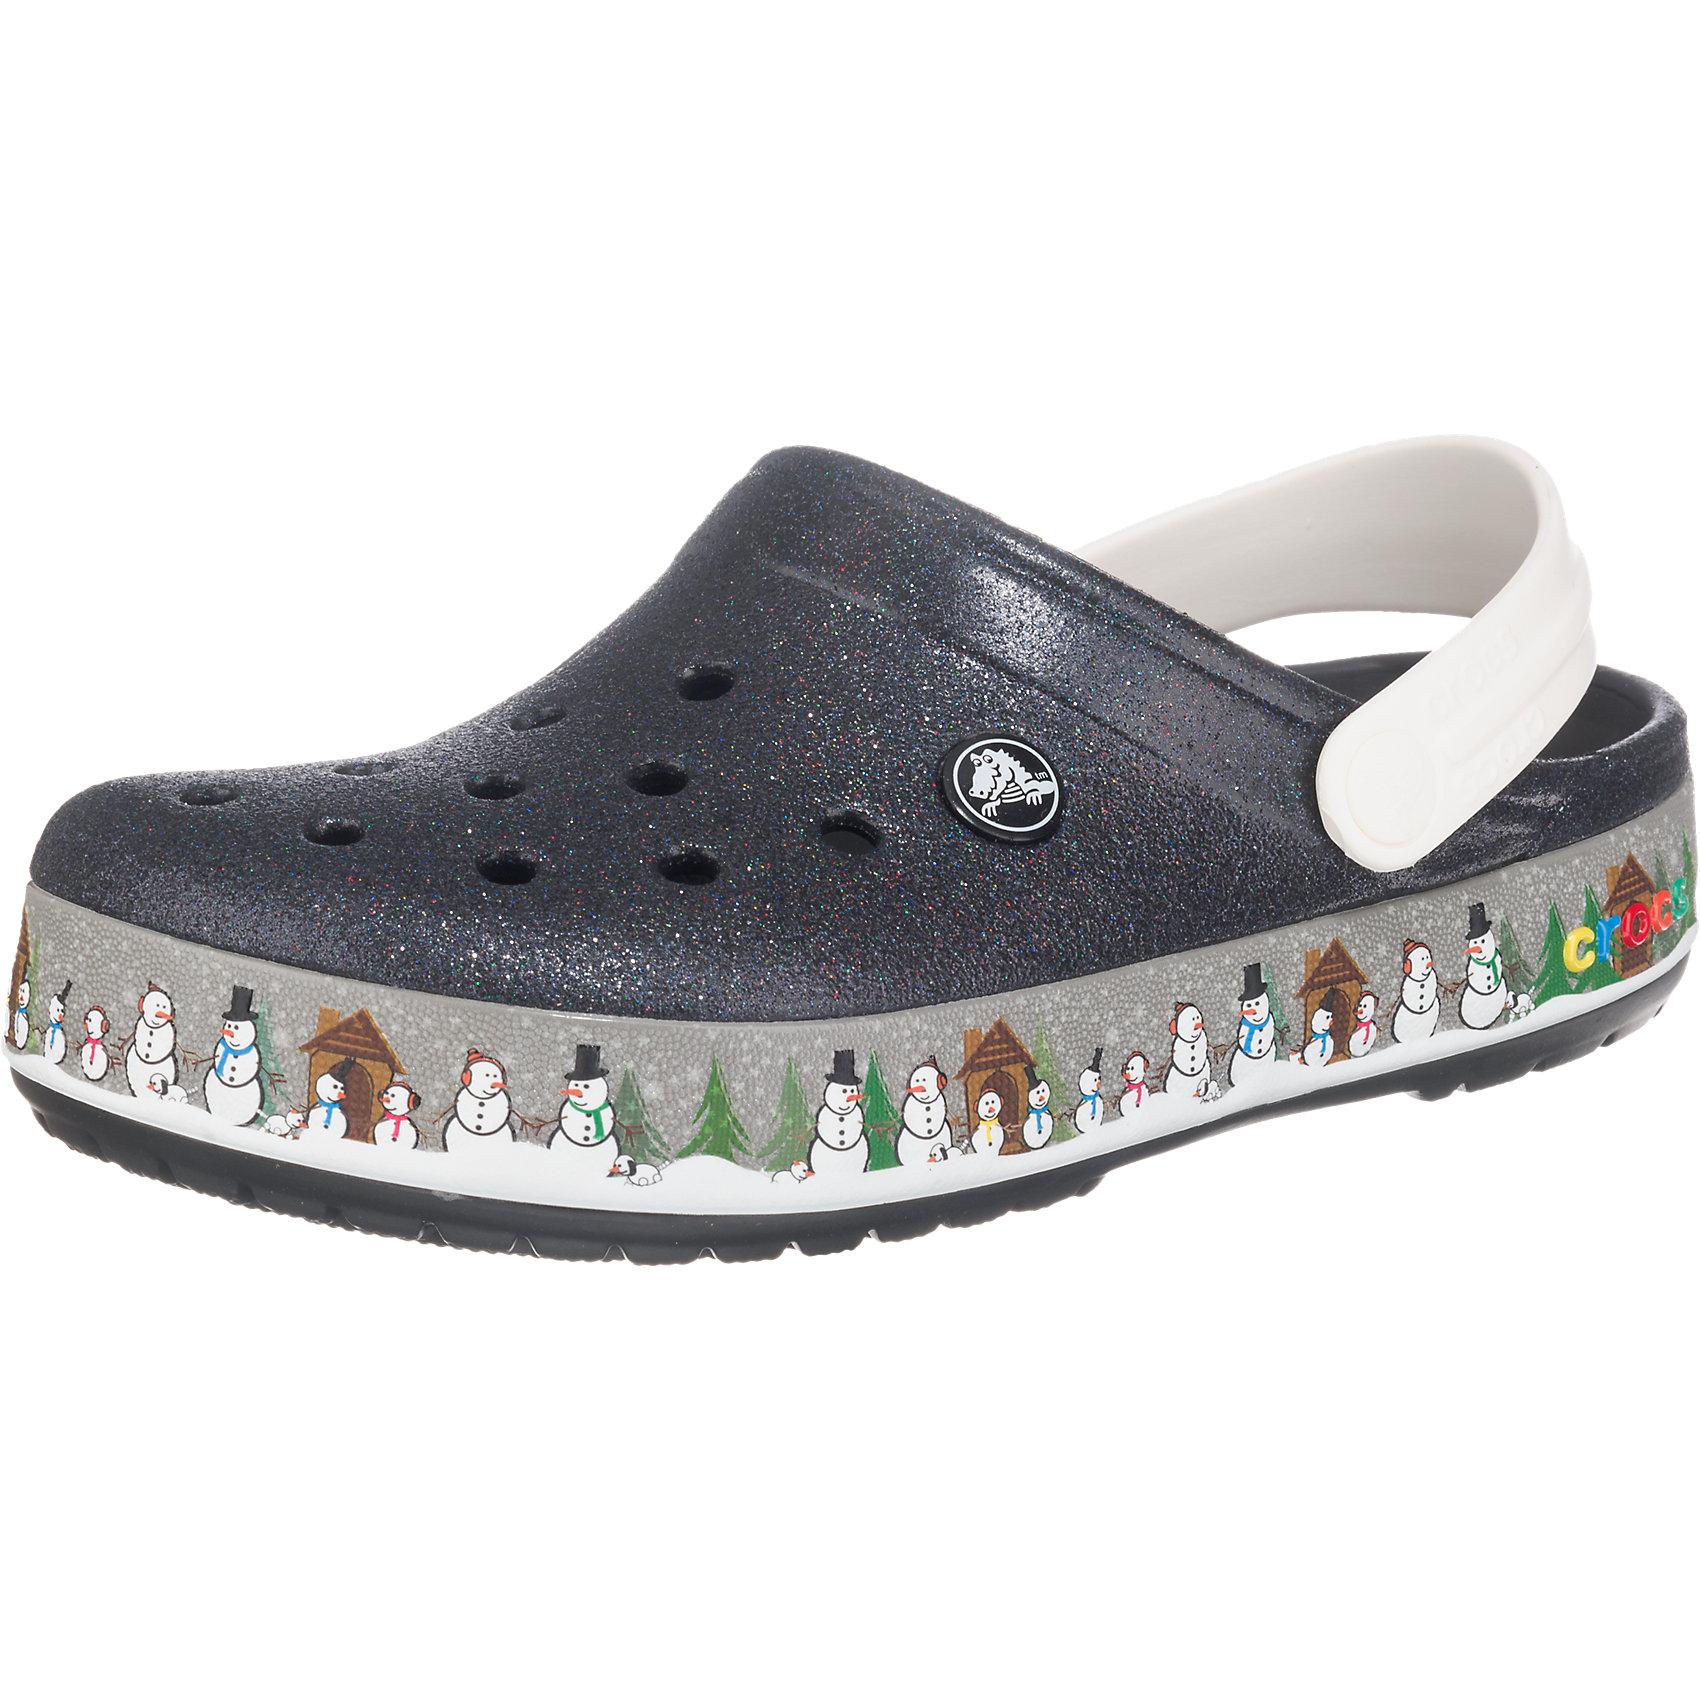 Crocs Crocband Holiday Clogs Damen 0Nebh